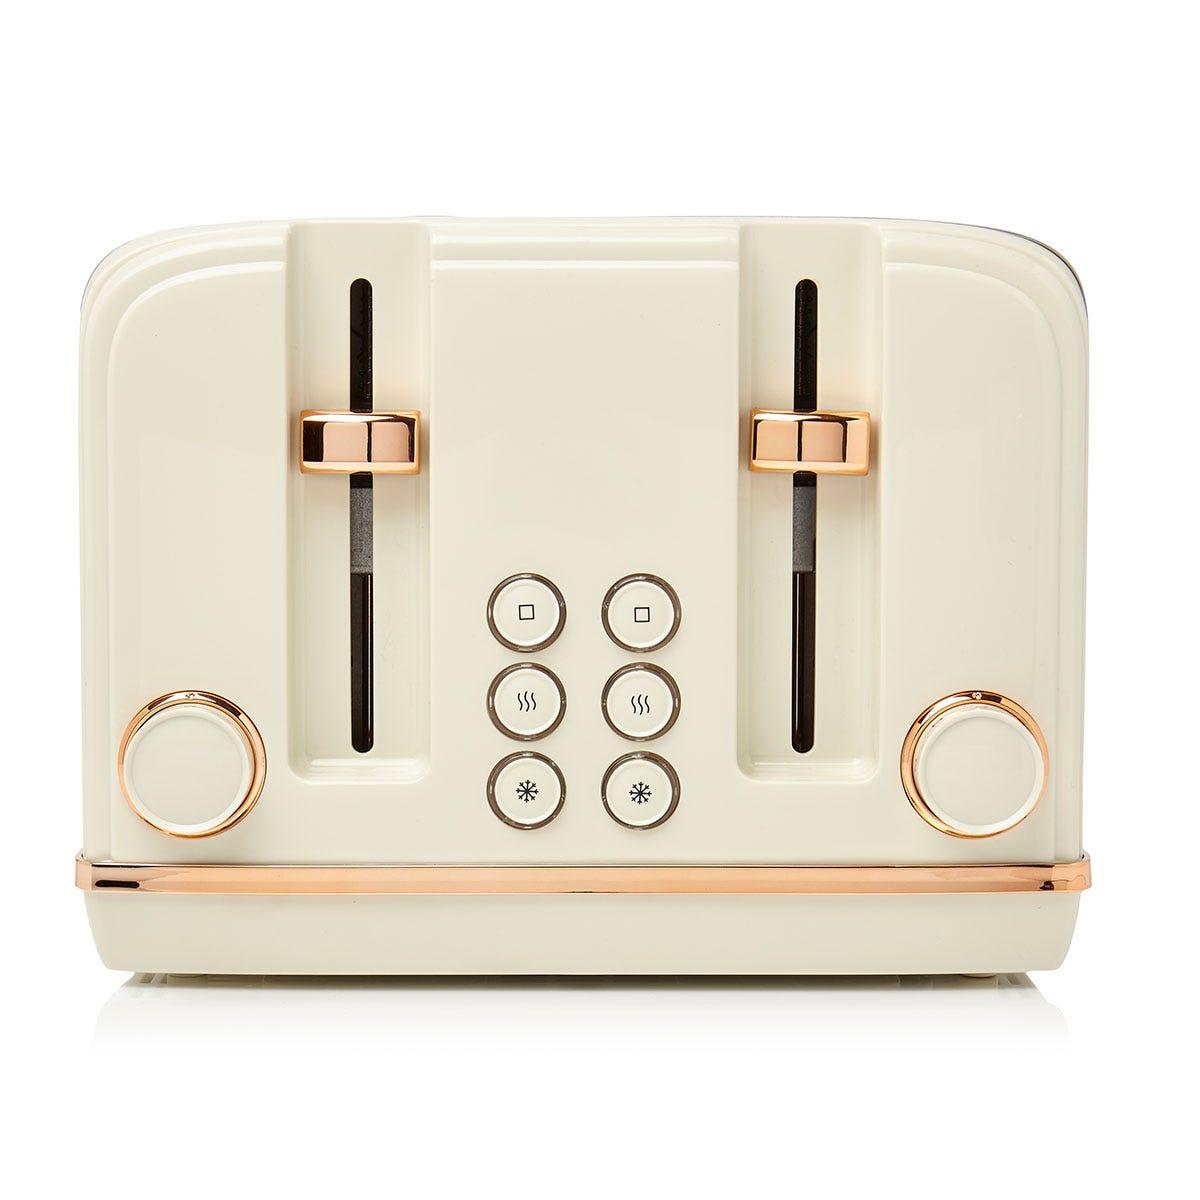 Haden Salcombe 2300W 4 Slice Wide Slot Toaster - Cream/Copper